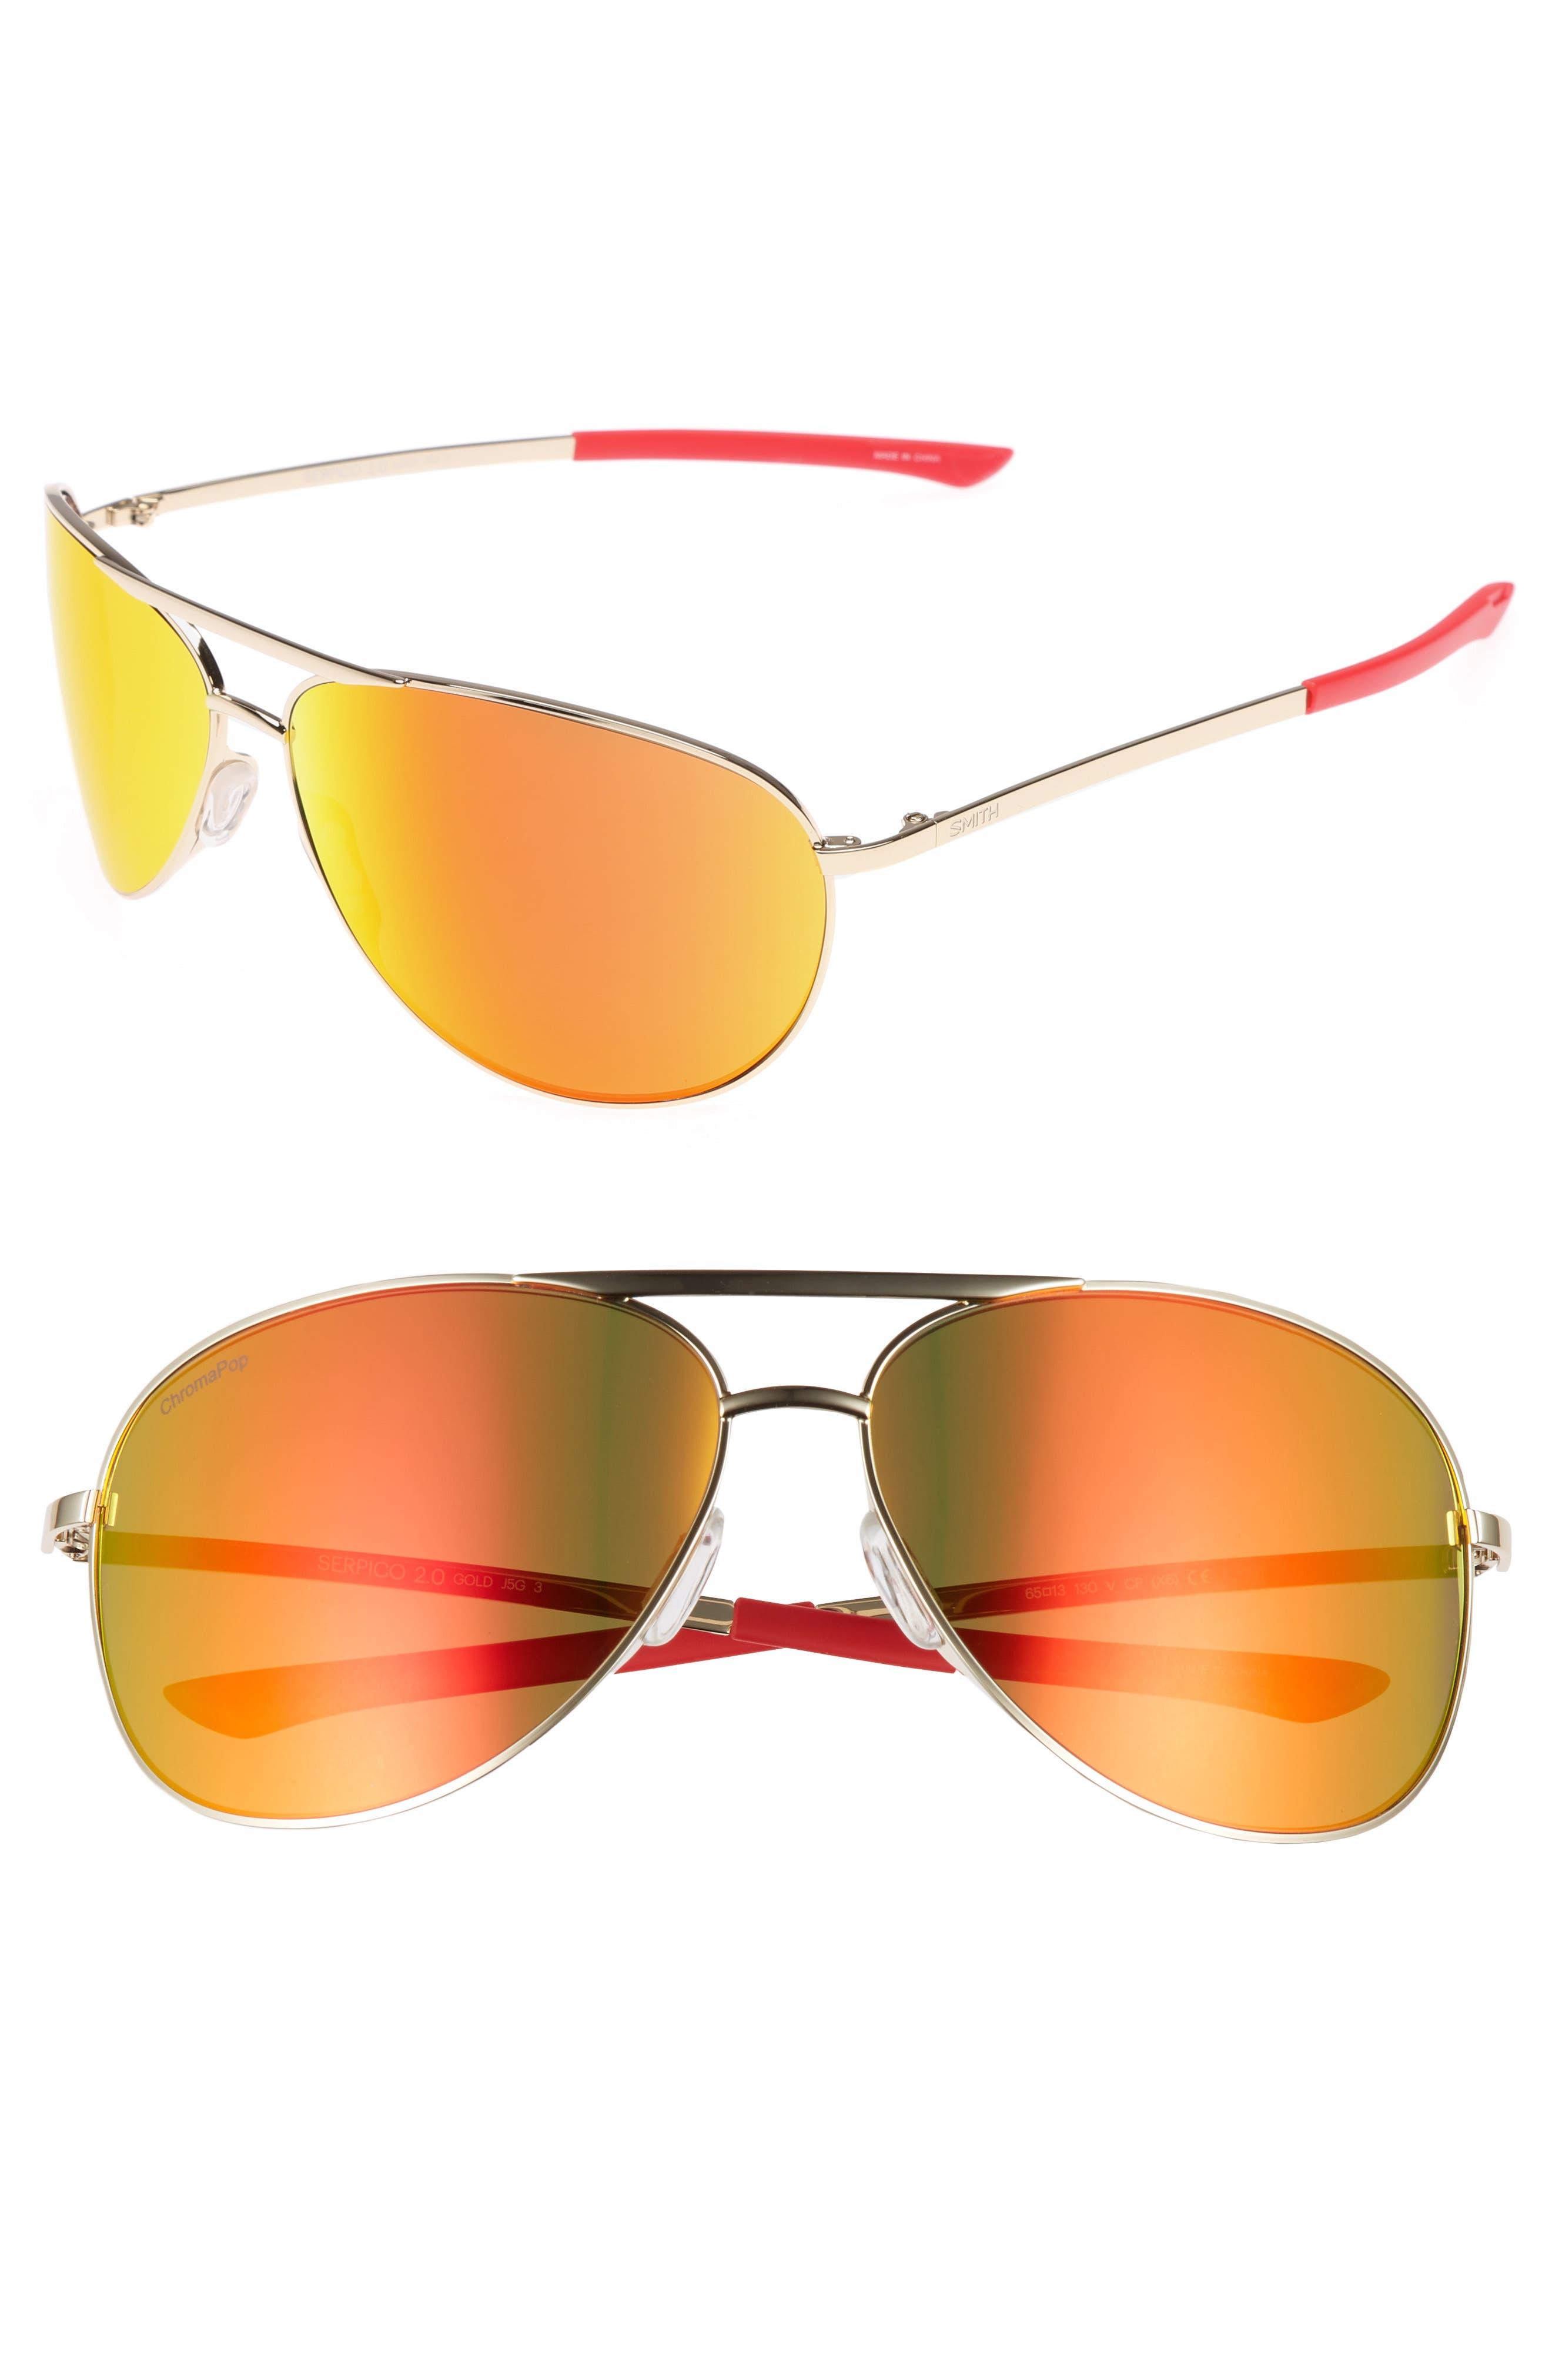 Serpico 2 65mm Mirrored ChromaPop<sup>™</sup> Polarized Aviator Sunglasses,                         Main,                         color, 710